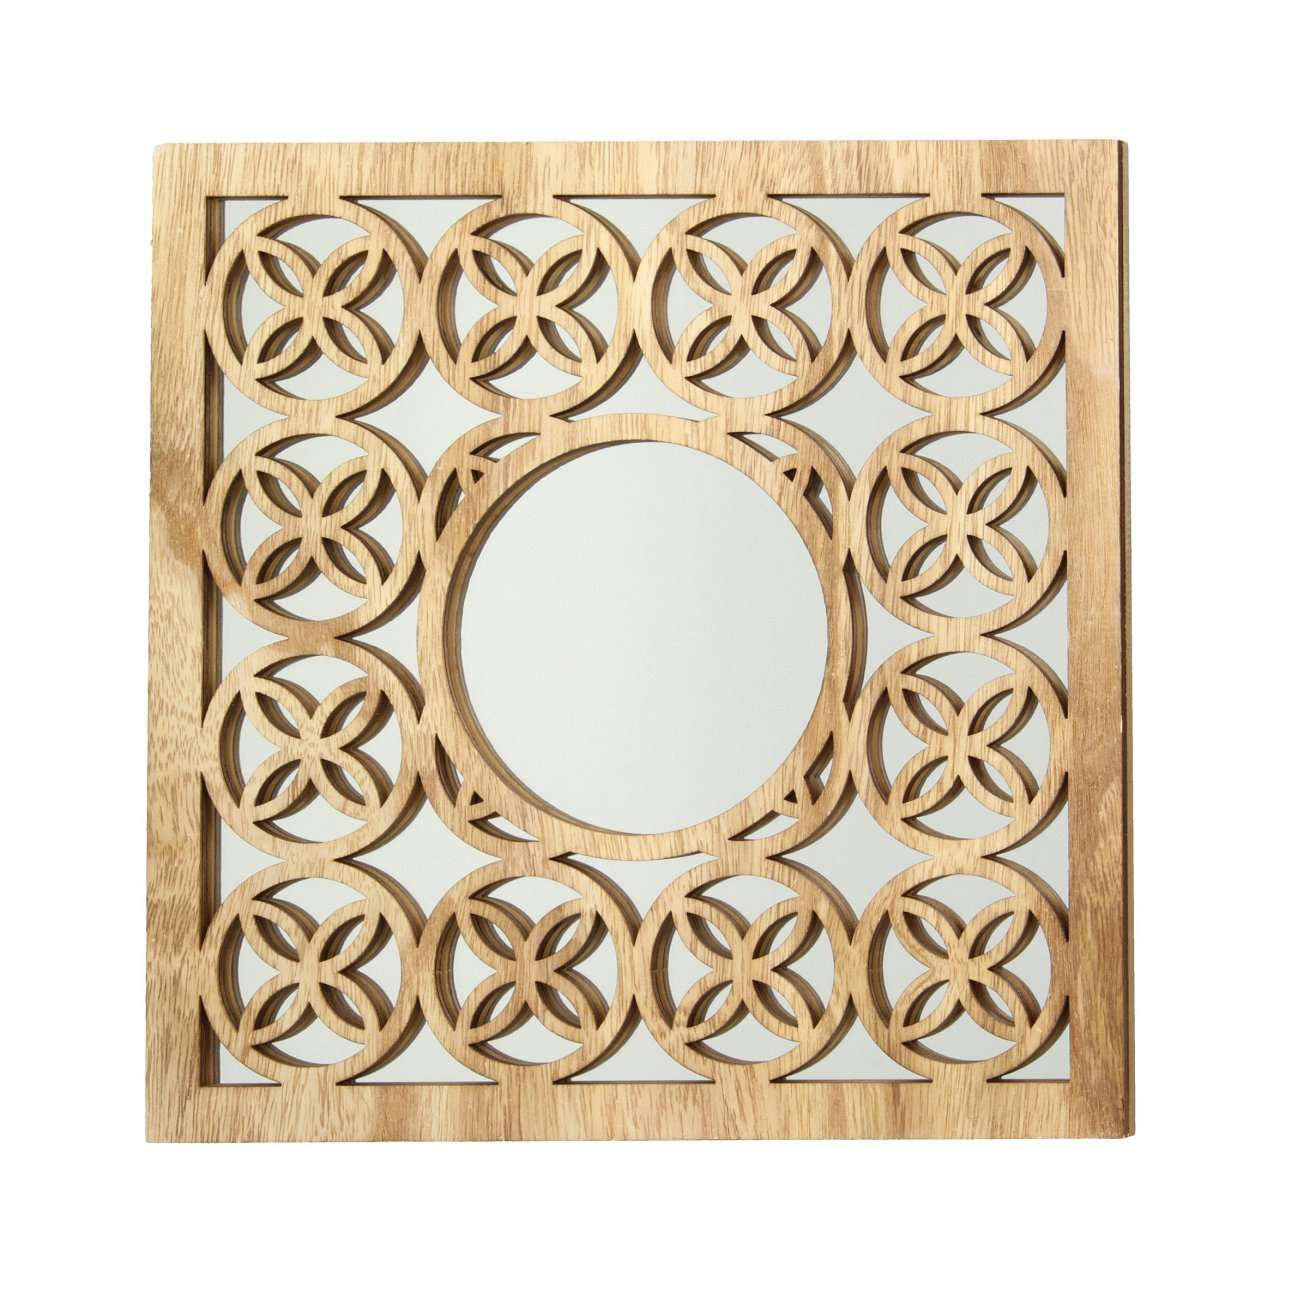 Spiegel Esmerald II 30x30cm, 30×1×30cm | Flur & Diele | Holz | Dekoria